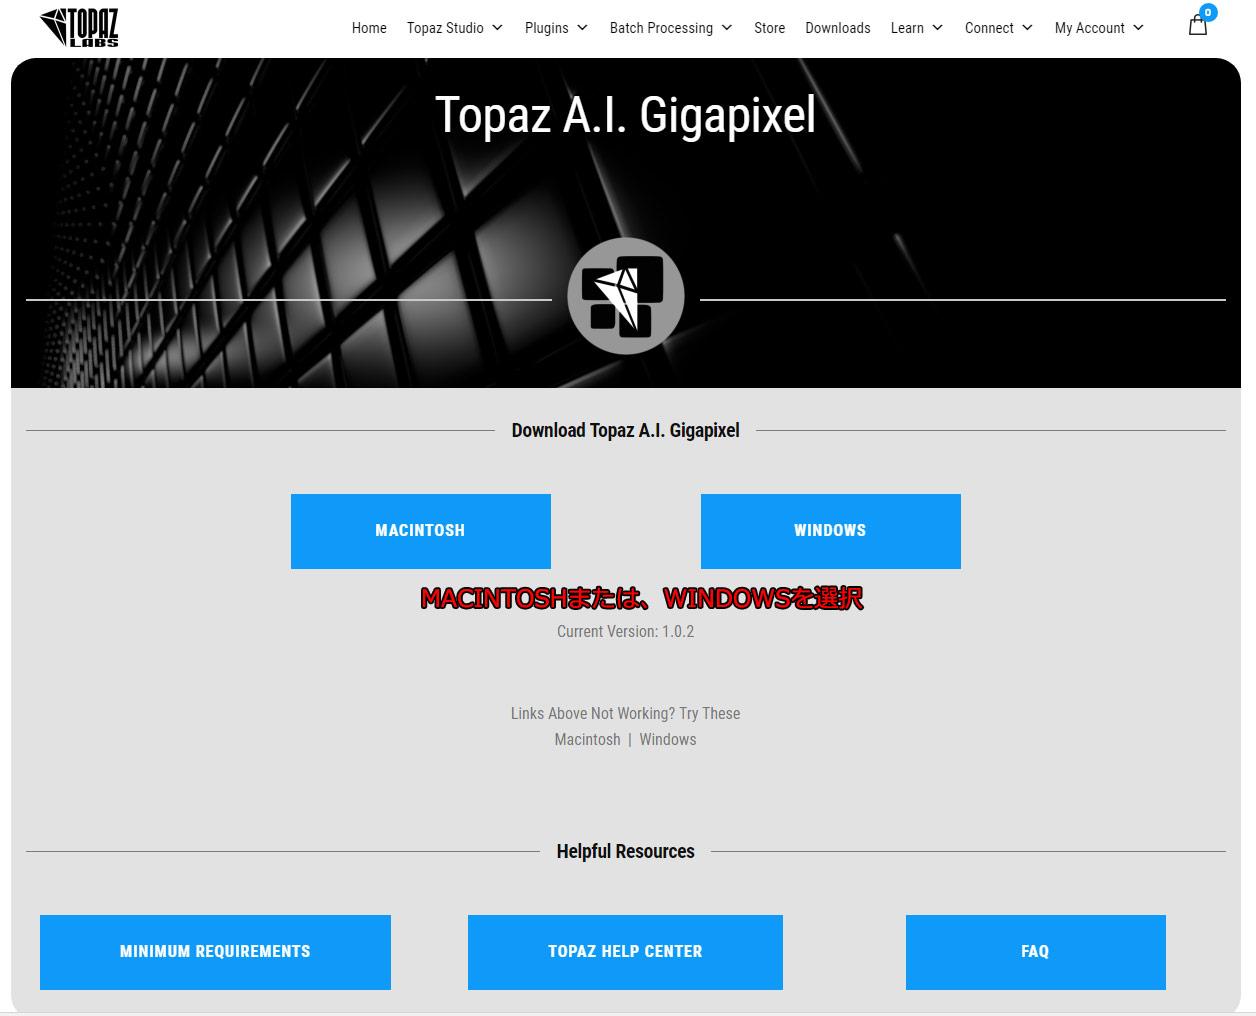 Topaz A.I. Gigapixelトライアル版